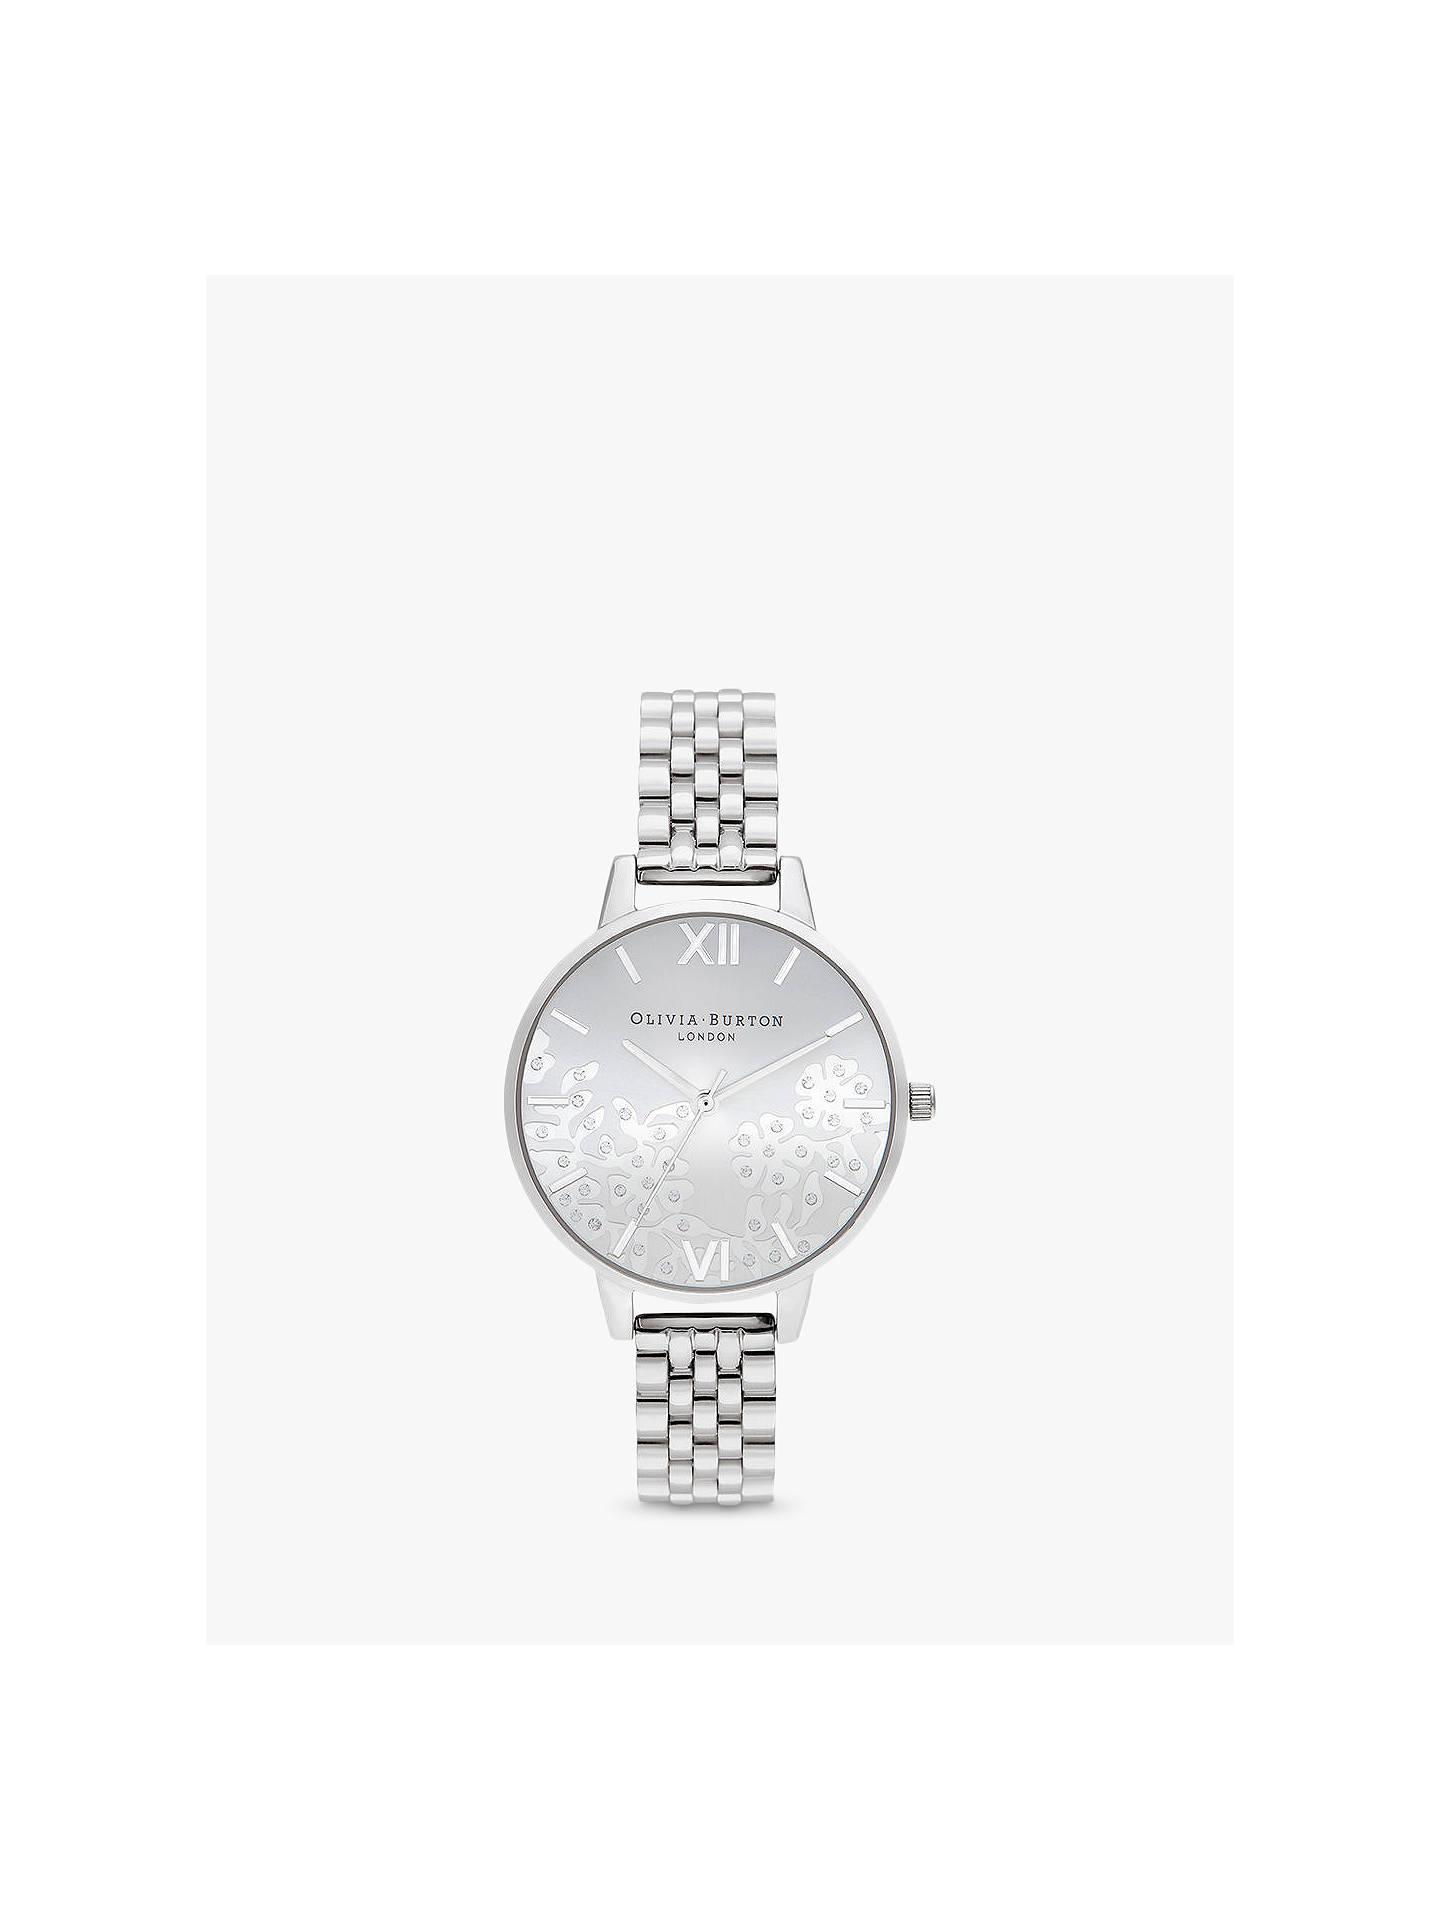 47665ef97 Buy Olivia Burton OB16MV101 Women's Bejewelled Lace Swarovski Crystal  Bracelet Strap Watch, Silver Online at ...